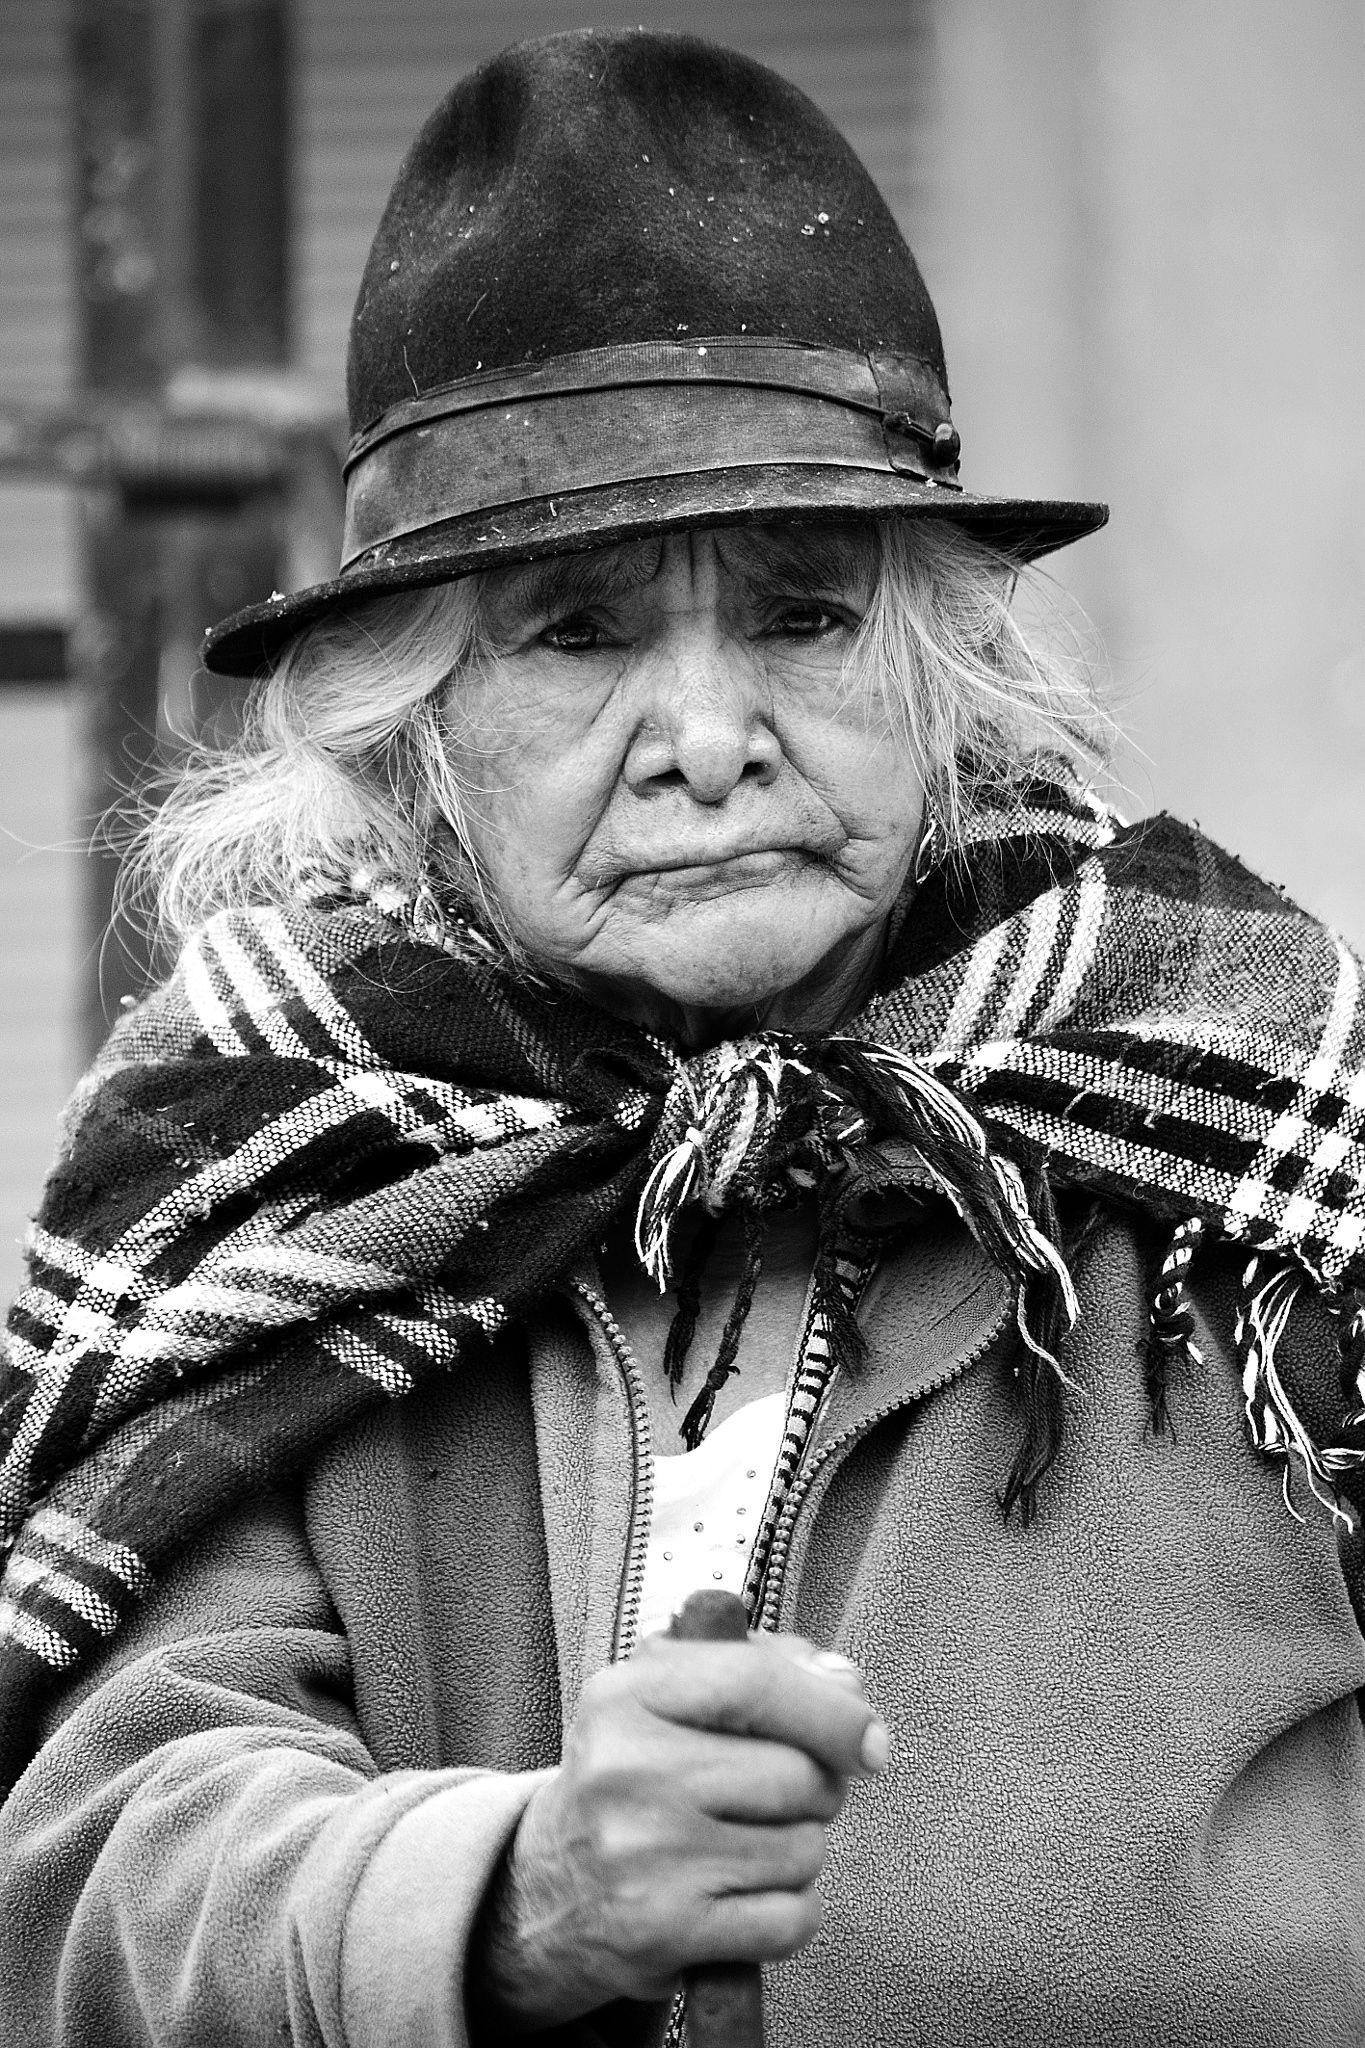 Esperanza - Hope - Persona anciana tradicional